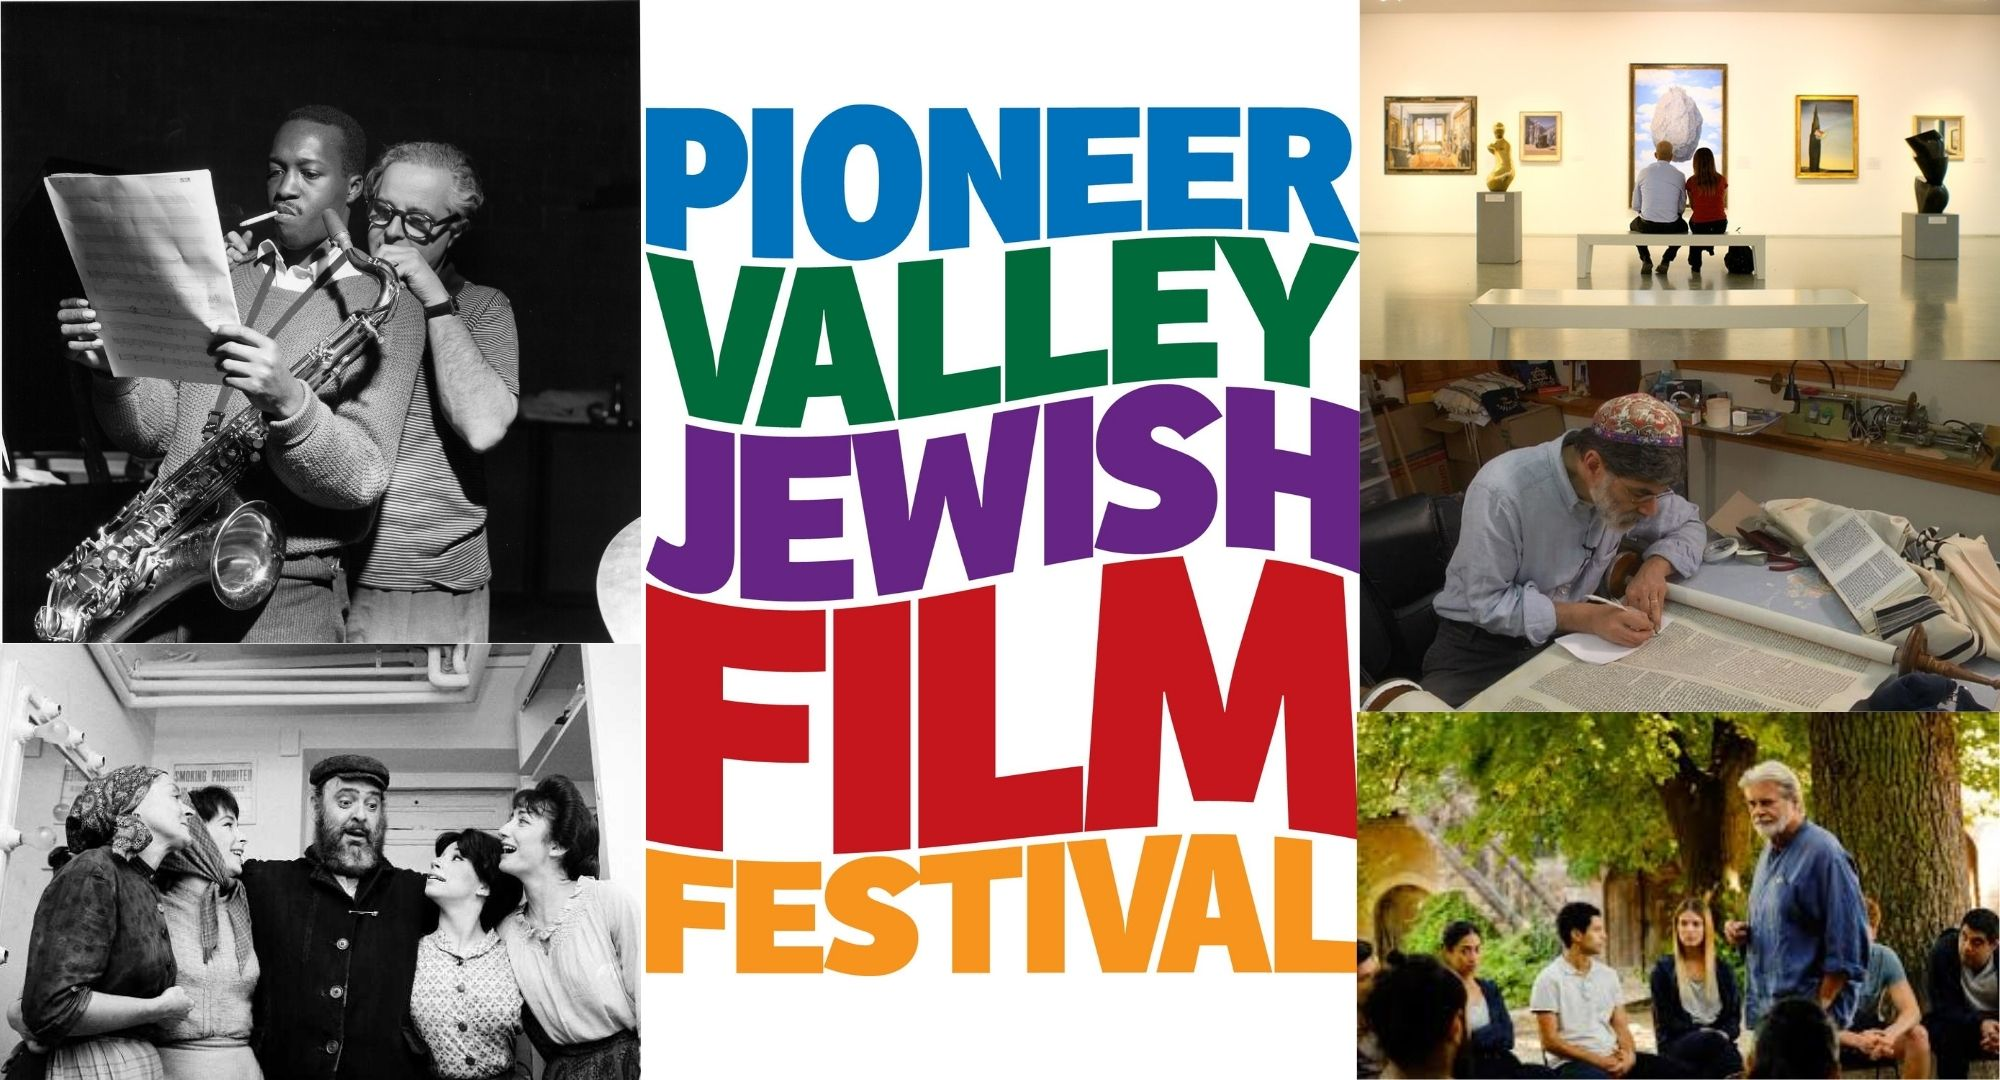 Enjoy the Pioneer Valley Jewish Film Festival